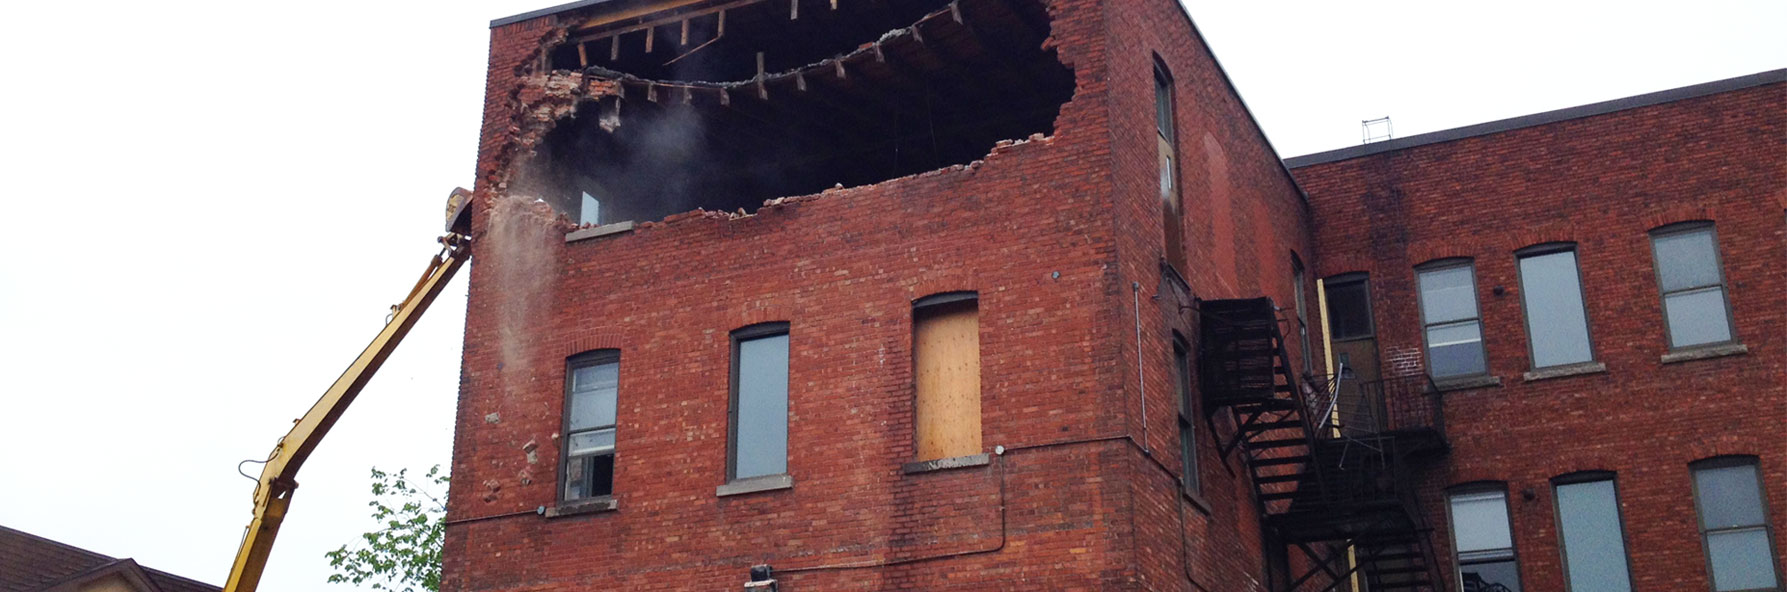 demolition-fortin